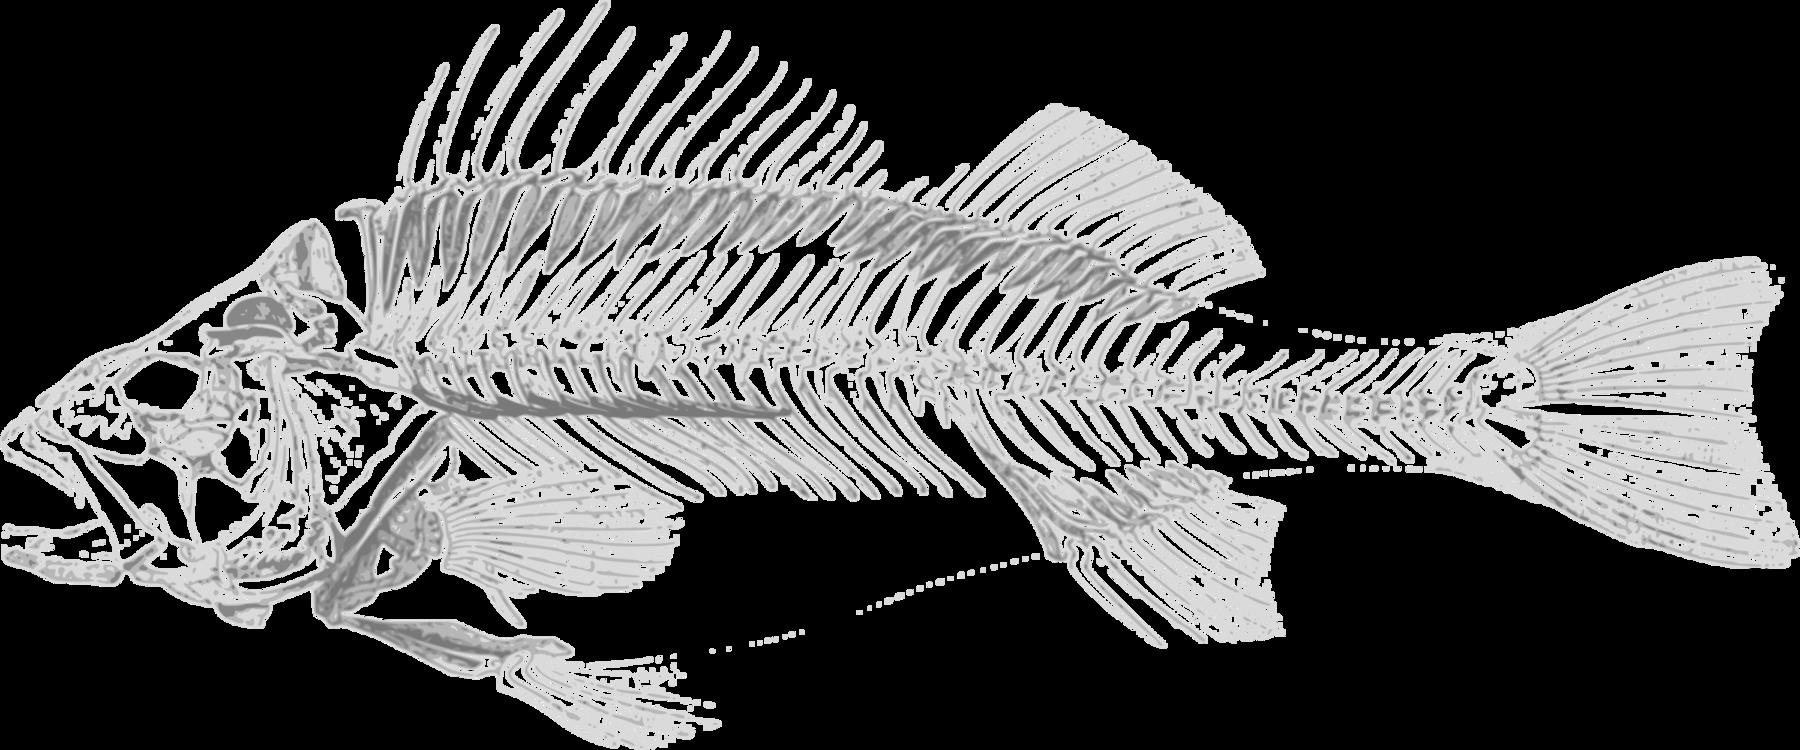 Perch,Line Art,Fish